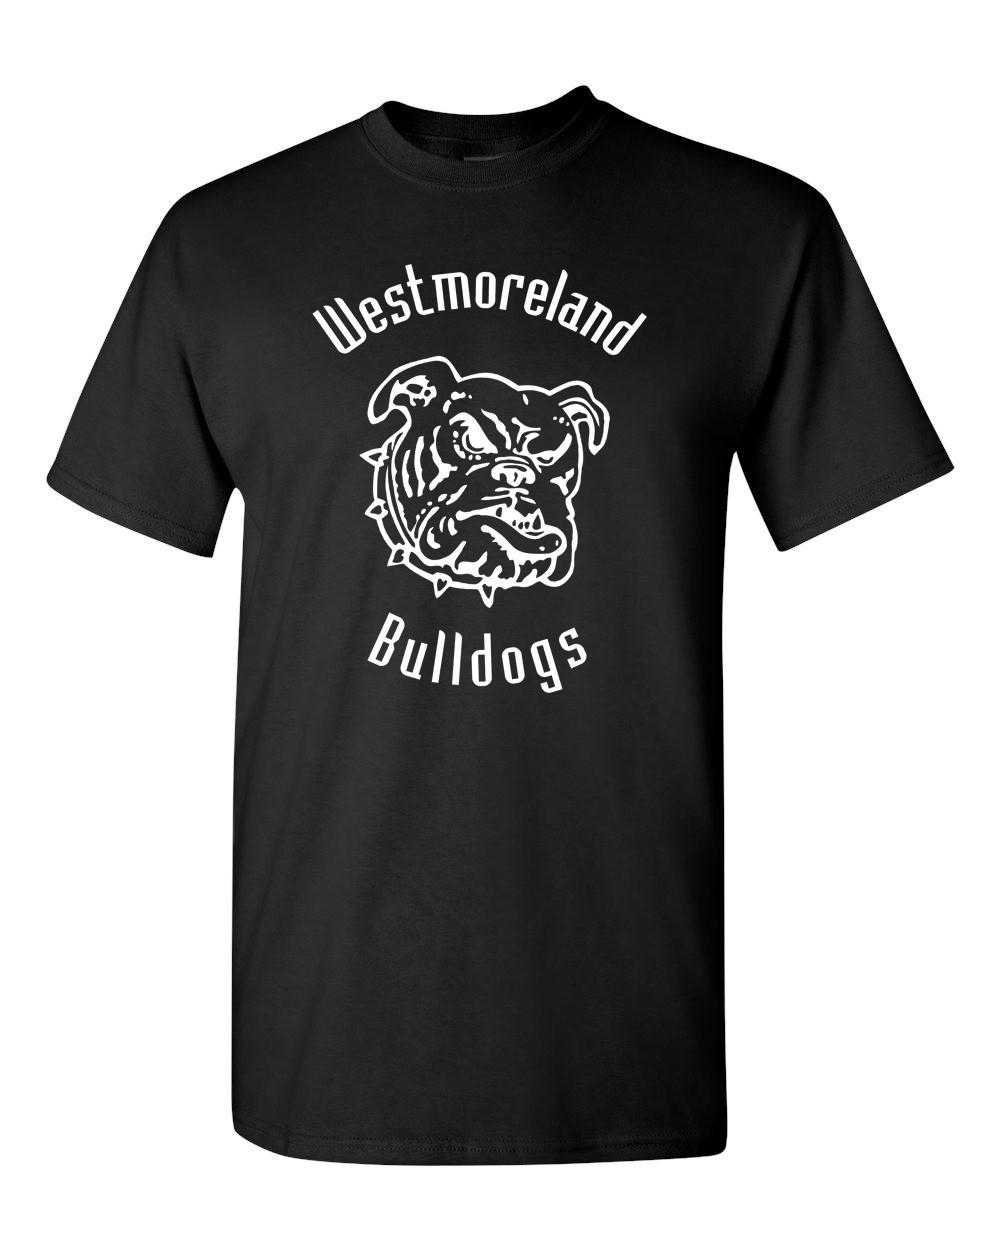 Gildan Westmoreland Bulldog Tees